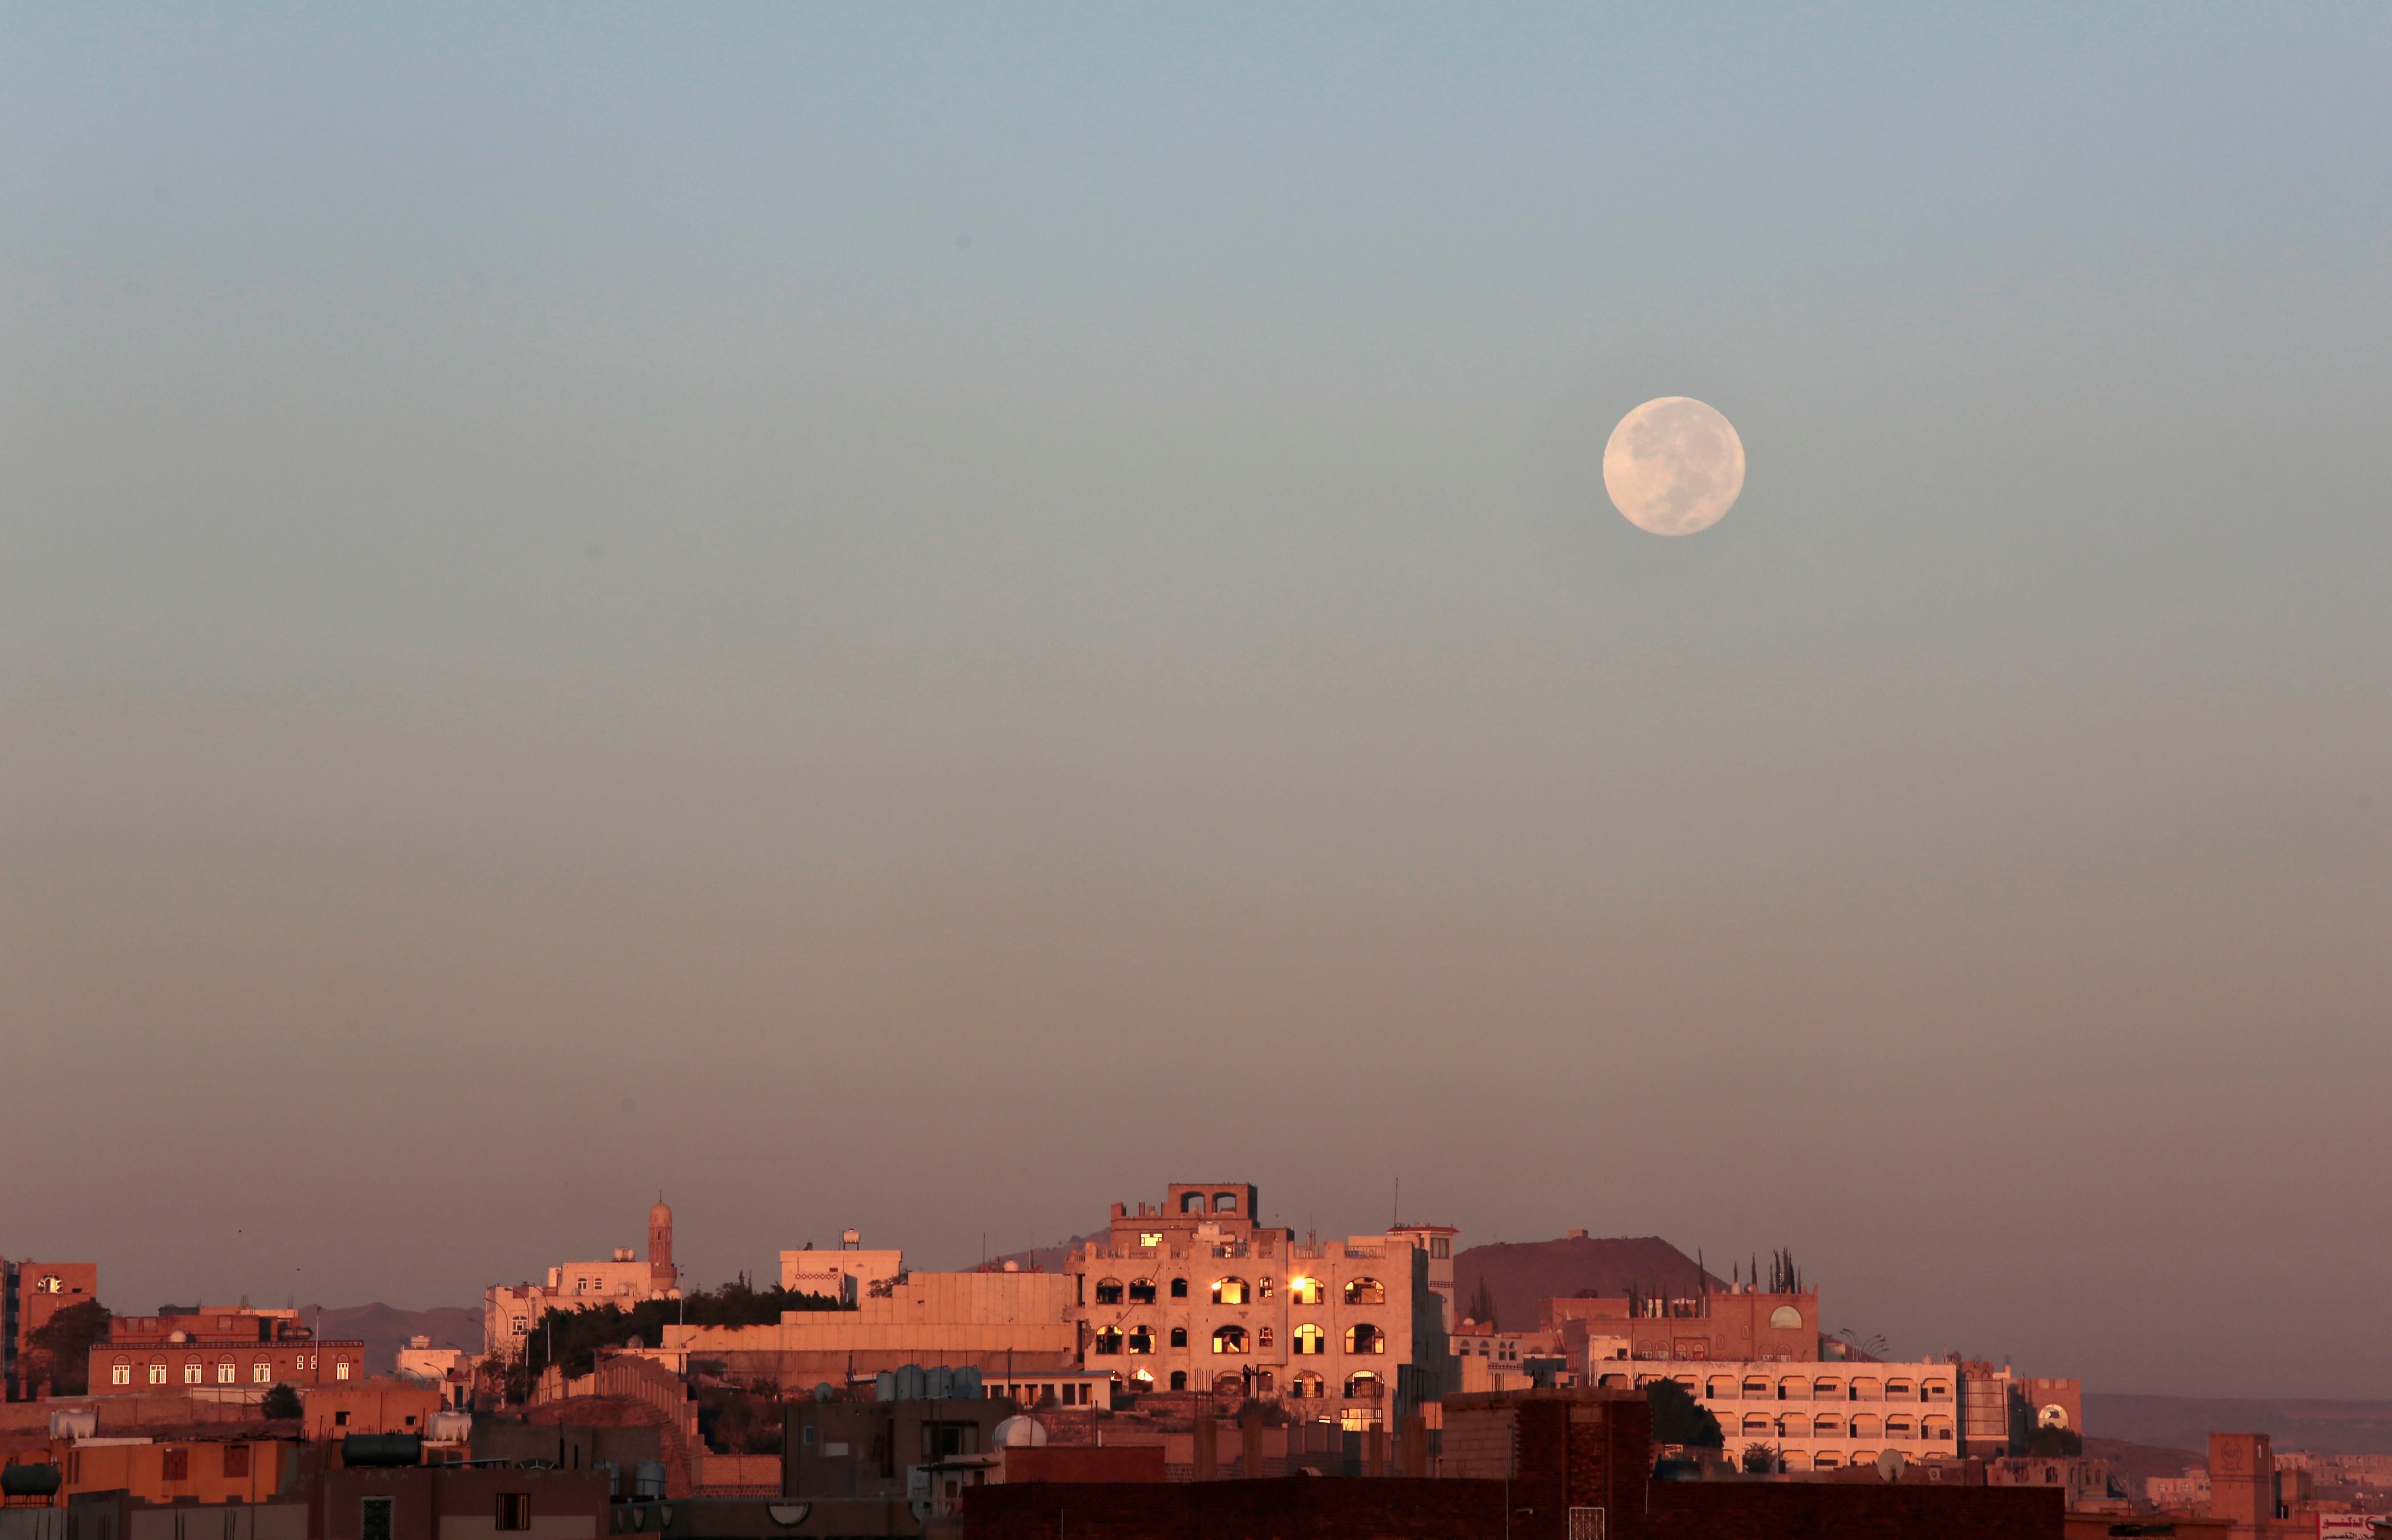 Clashes between US troops, al-Qaida militants in Yemen